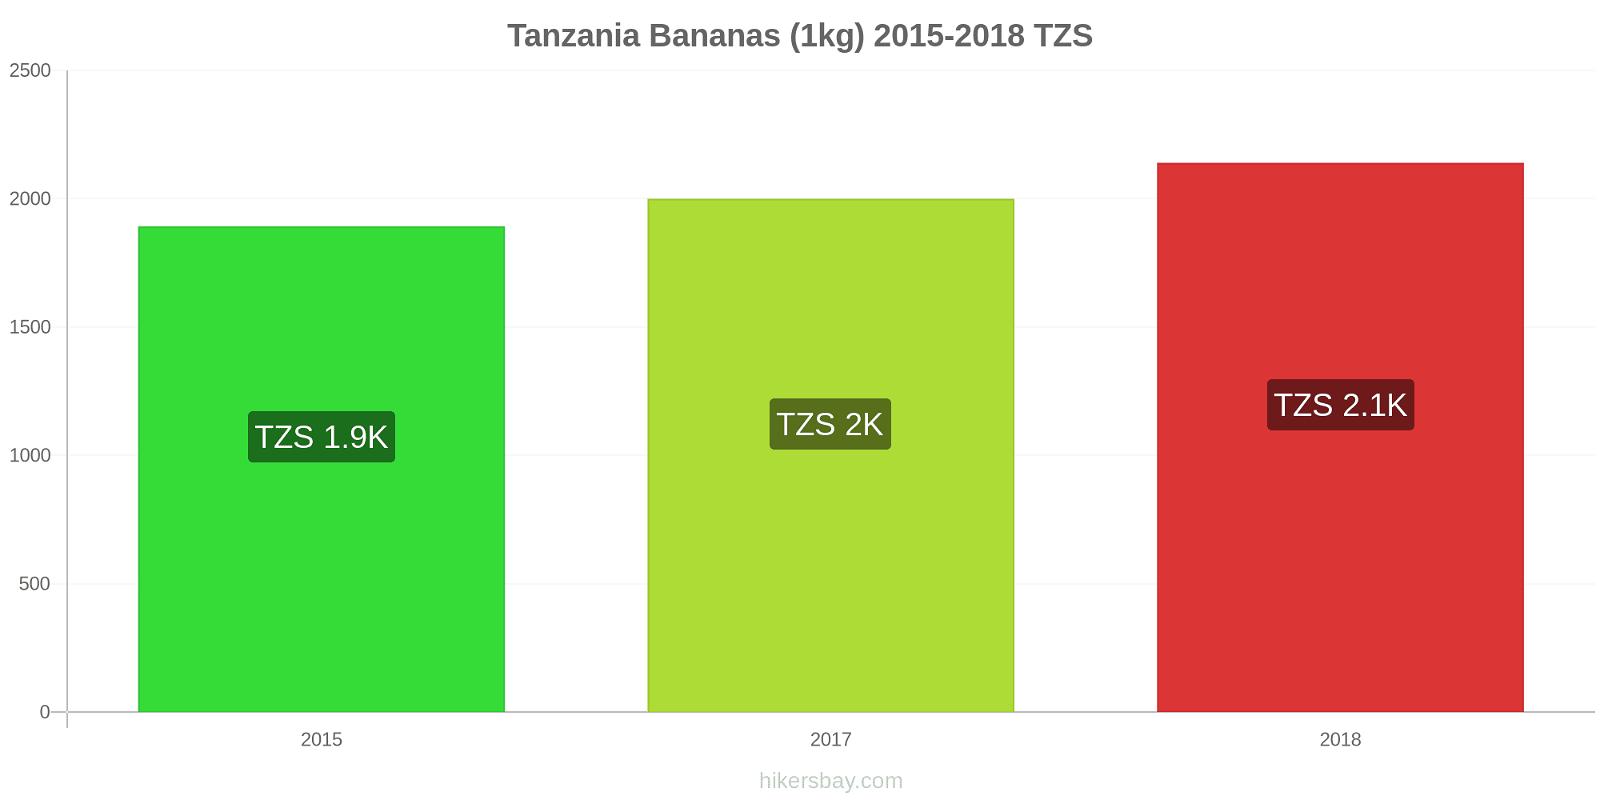 Tanzania price changes Bananas (1kg) hikersbay.com